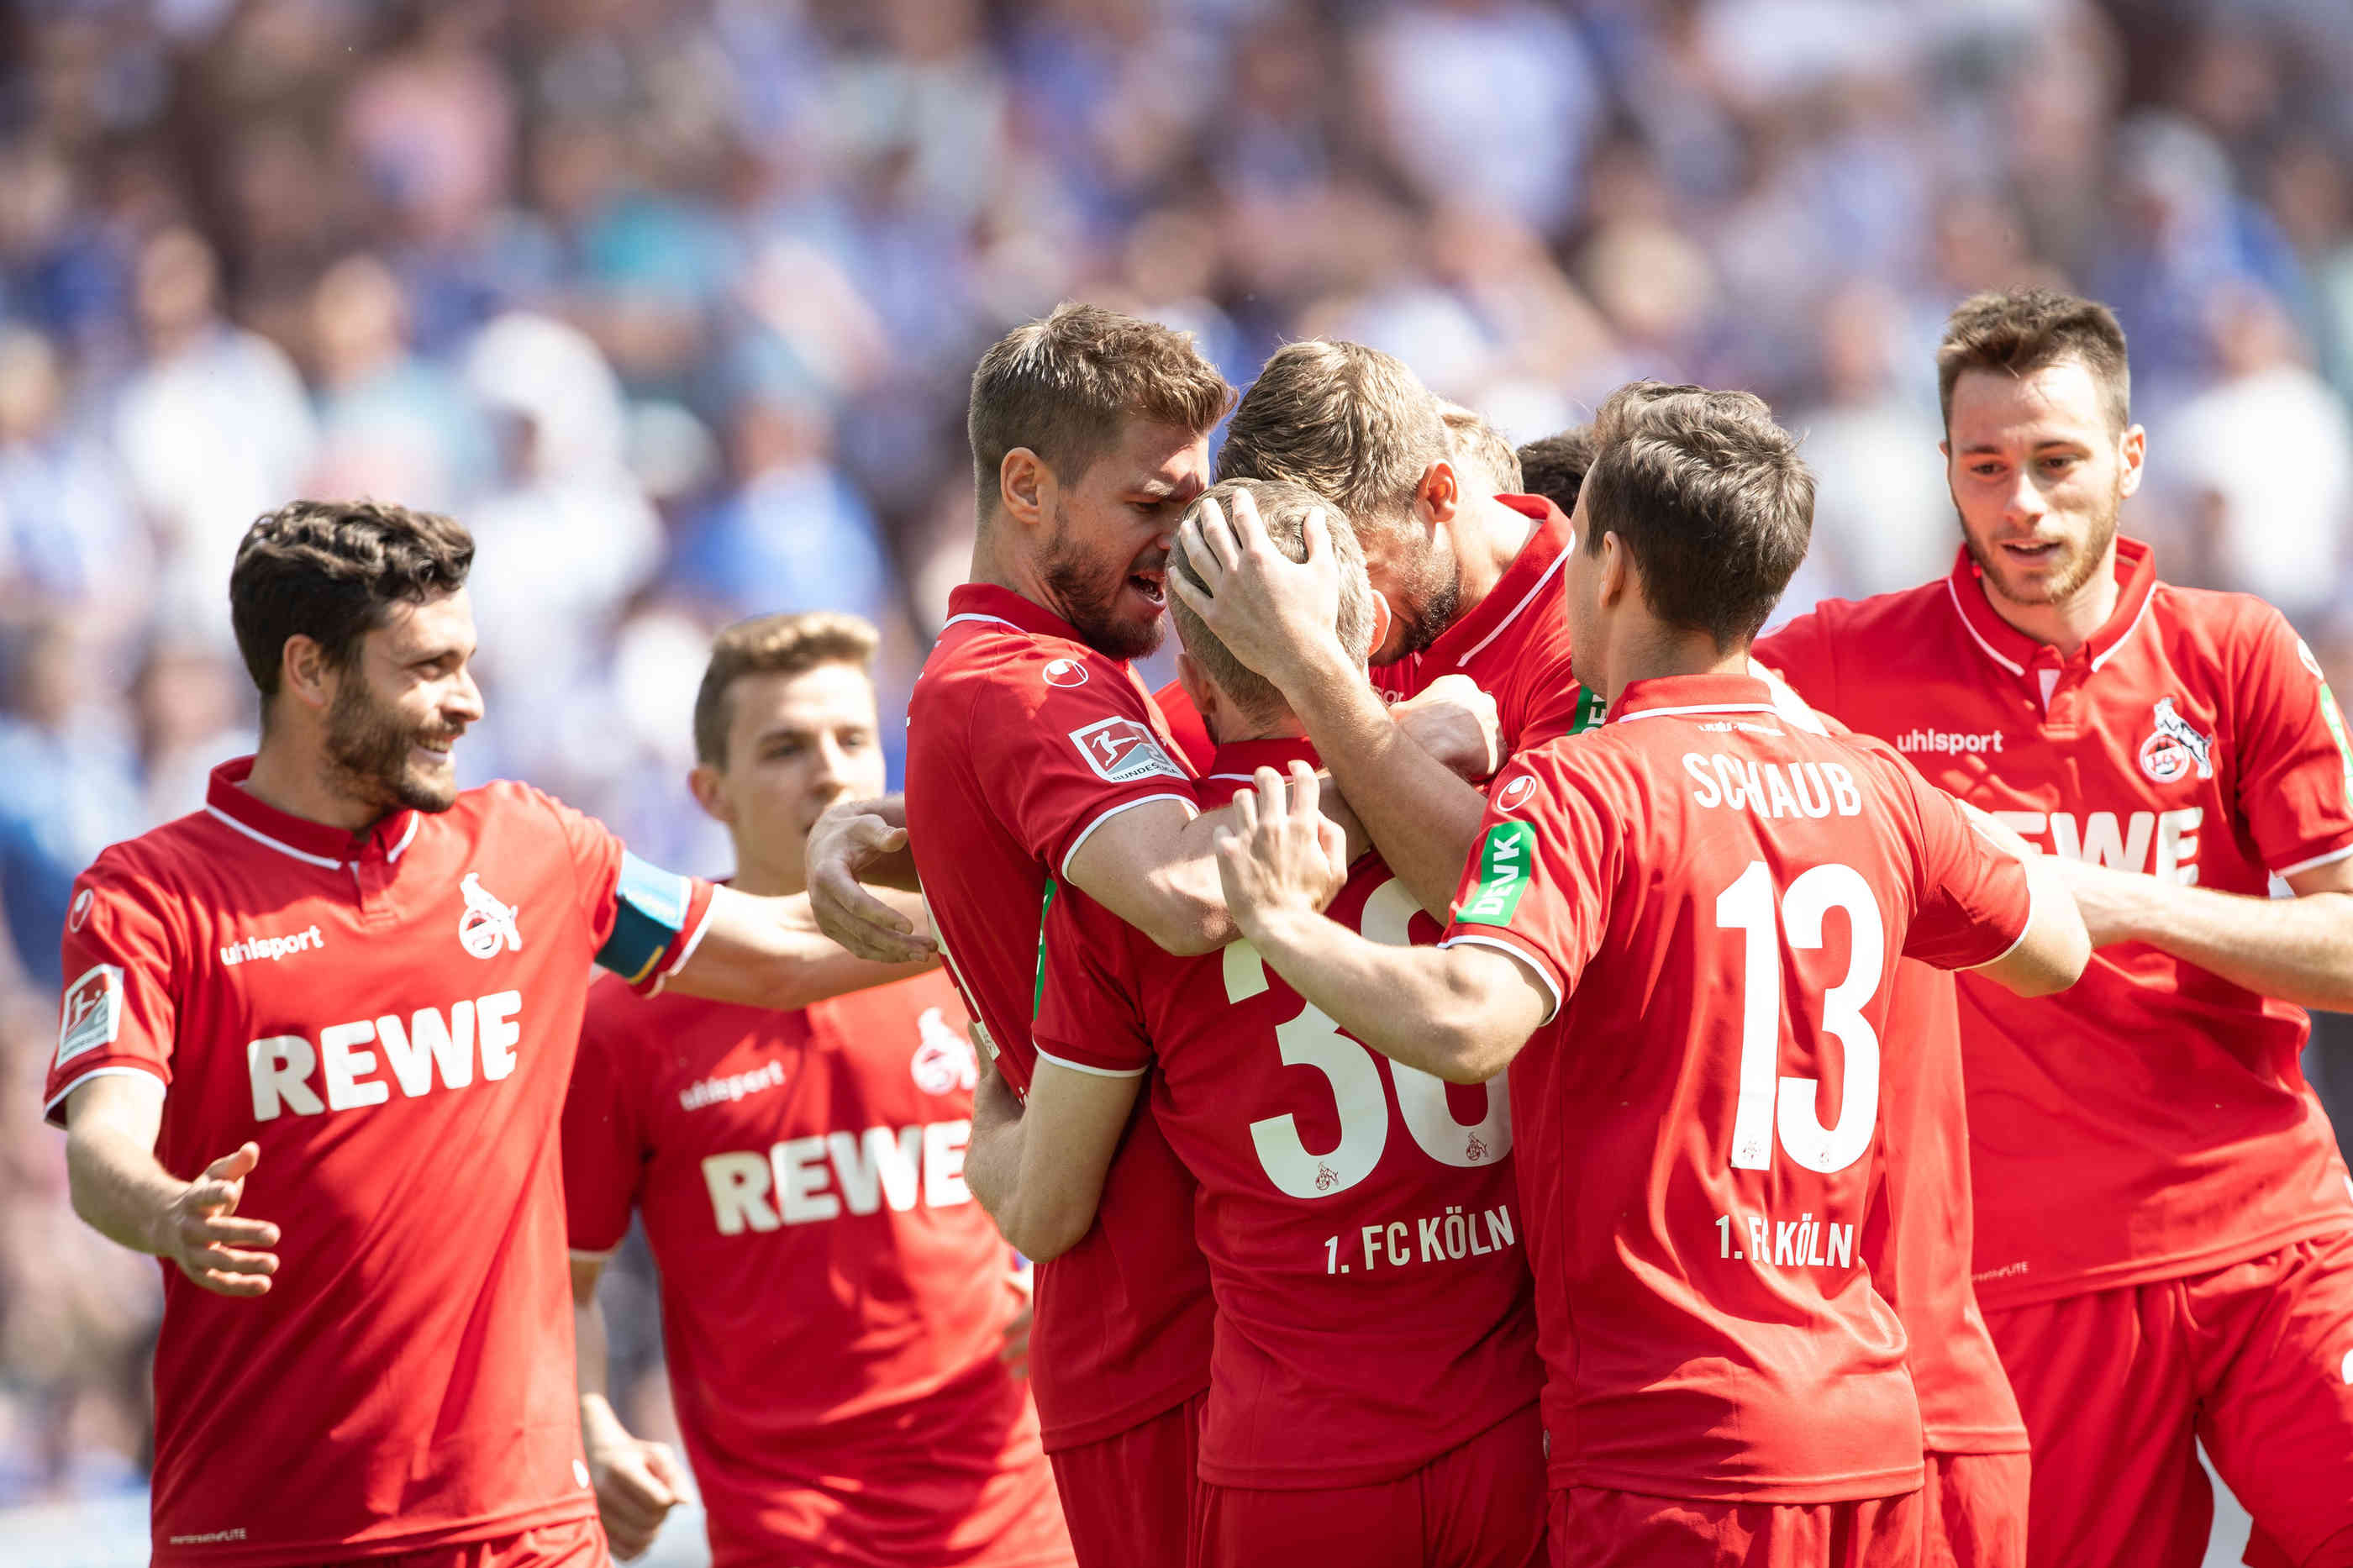 Köln Gegen Magdeburg